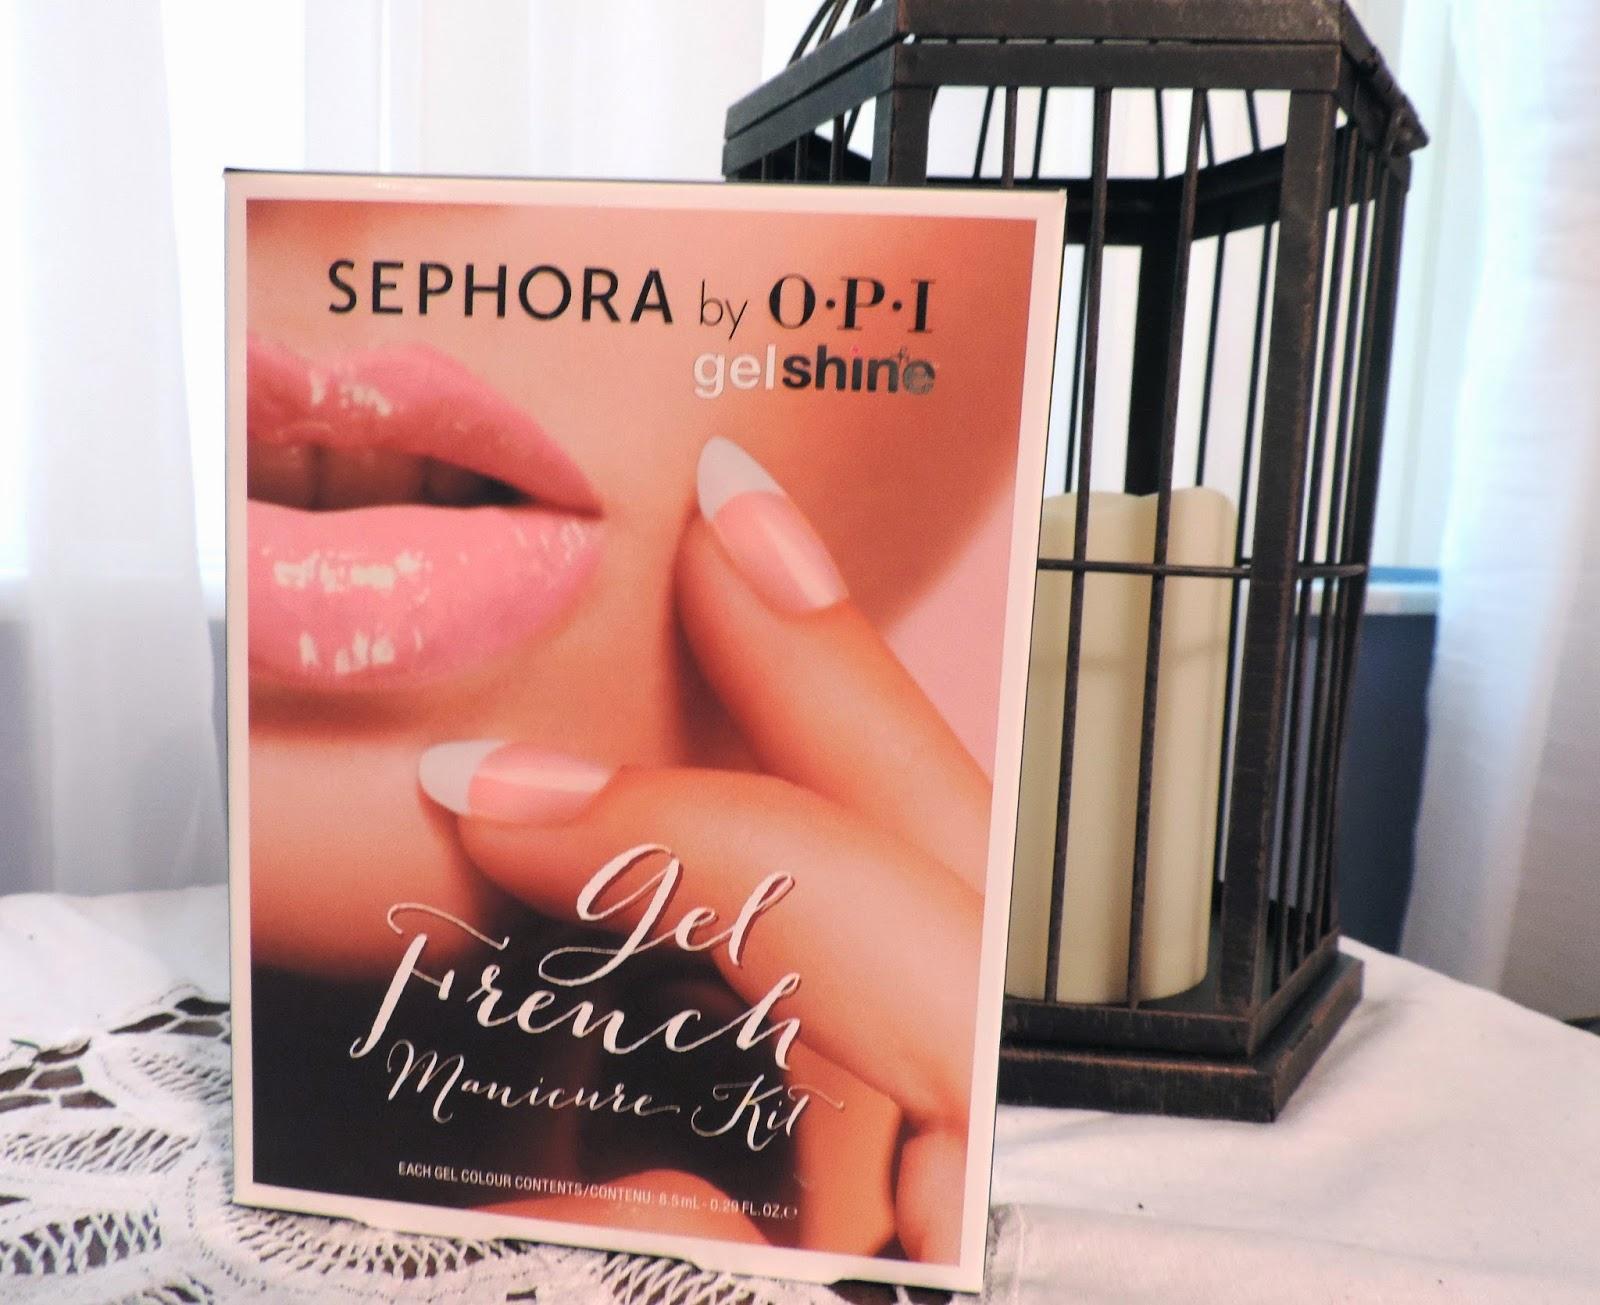 Mani Monday: Sephora by OPI Gel French Manicure Kit